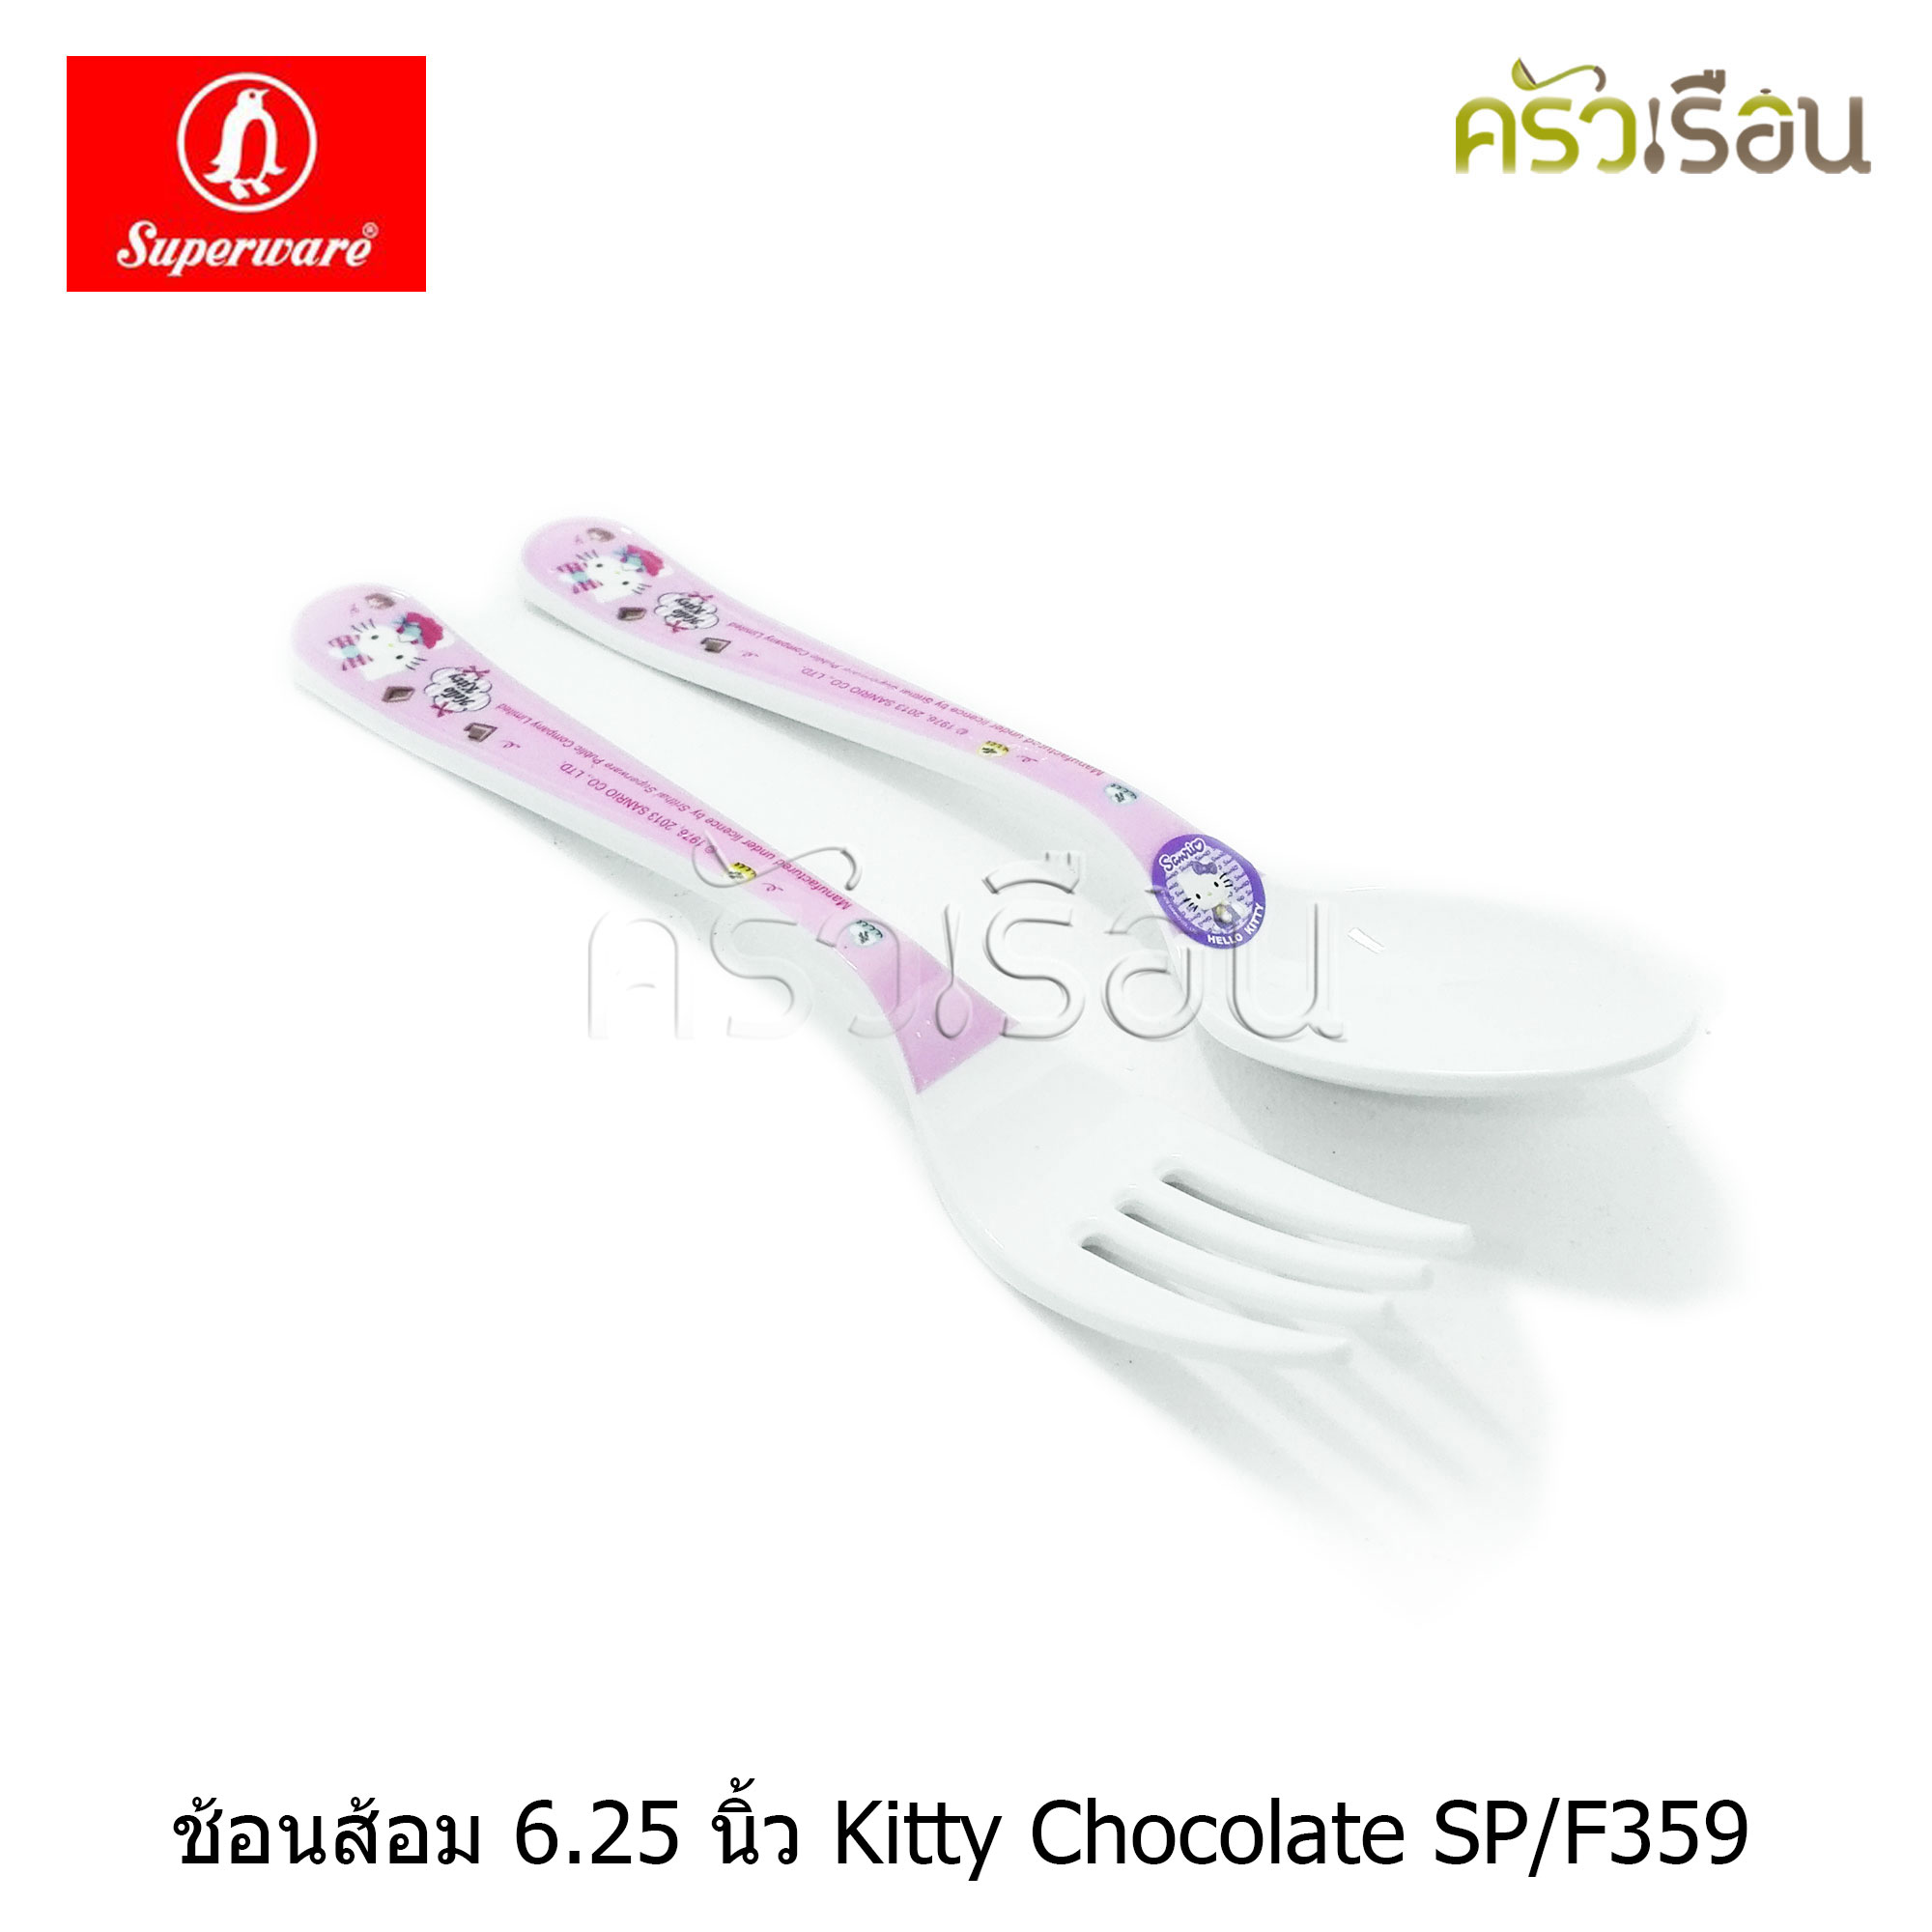 Superware ช้อนส้อม 6.25 นิ้ว Kitty Chocolate SP/F359